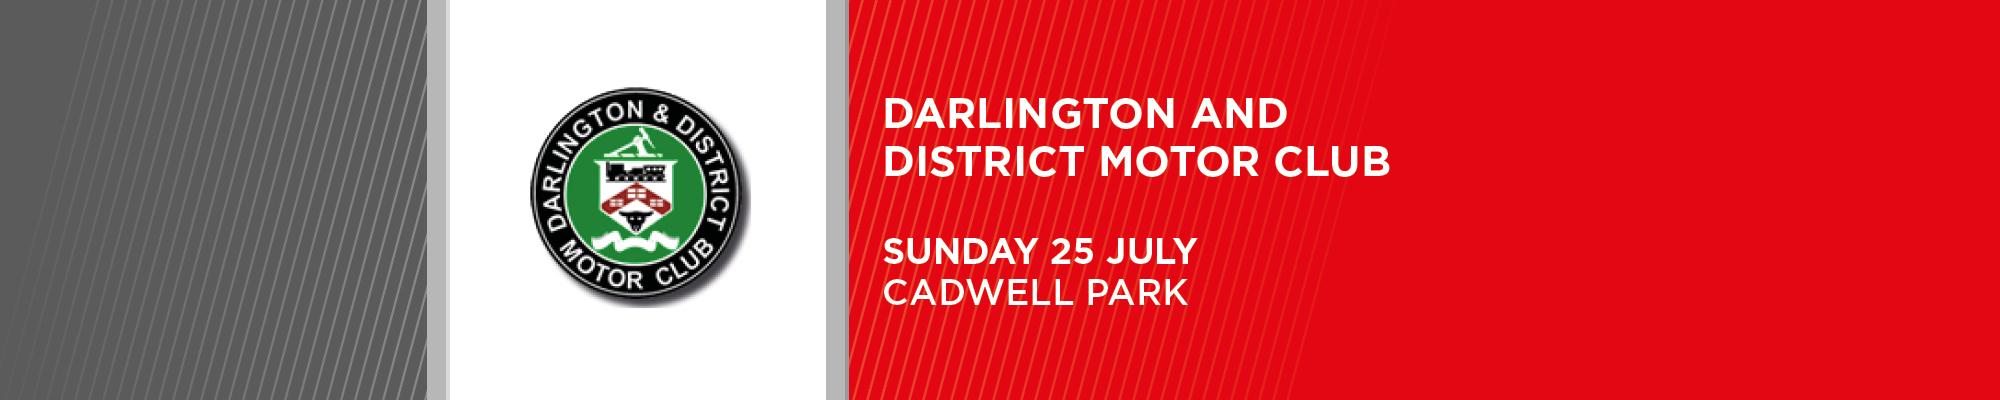 Darlington and District Motor Club